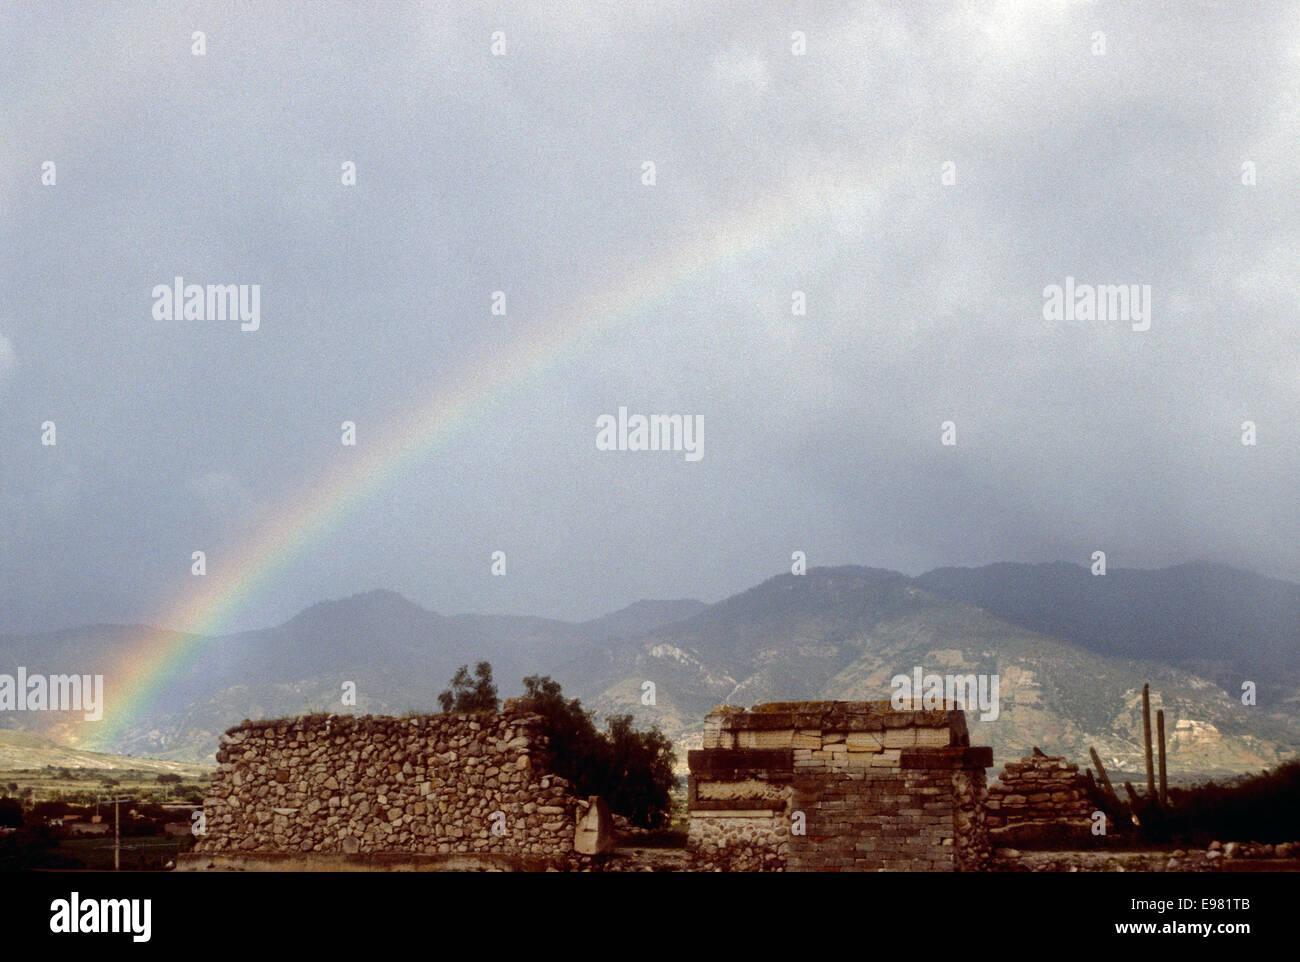 Rainbow over the Zapotec ruins of Mitla, Oaxaca, Mexico Stock Photo